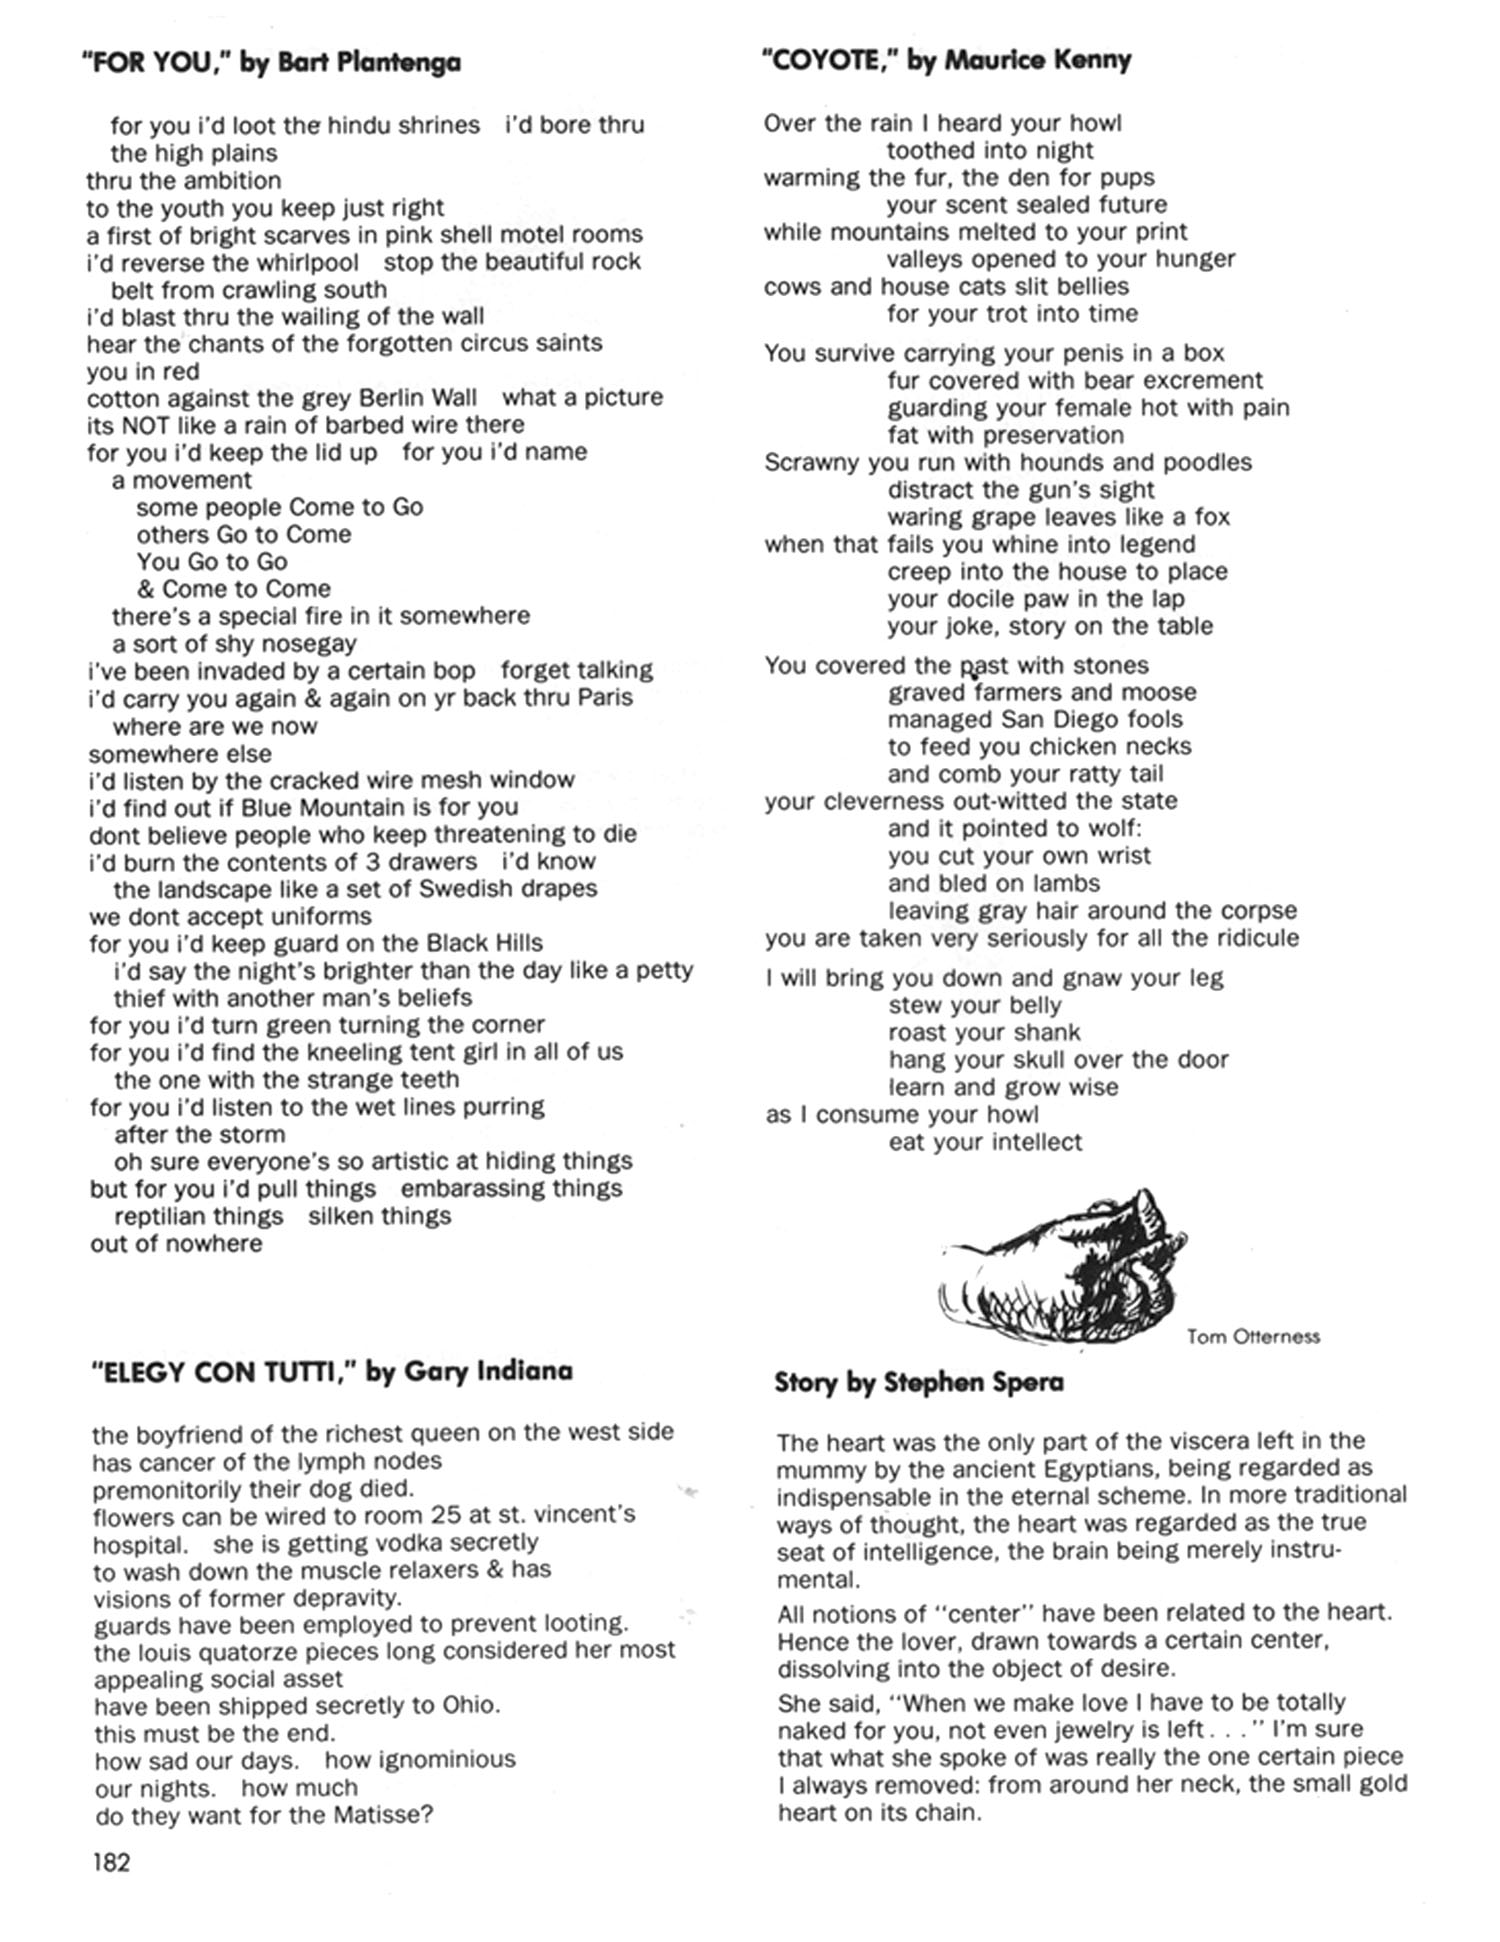 abc-no-rio-poetry-11.jpg